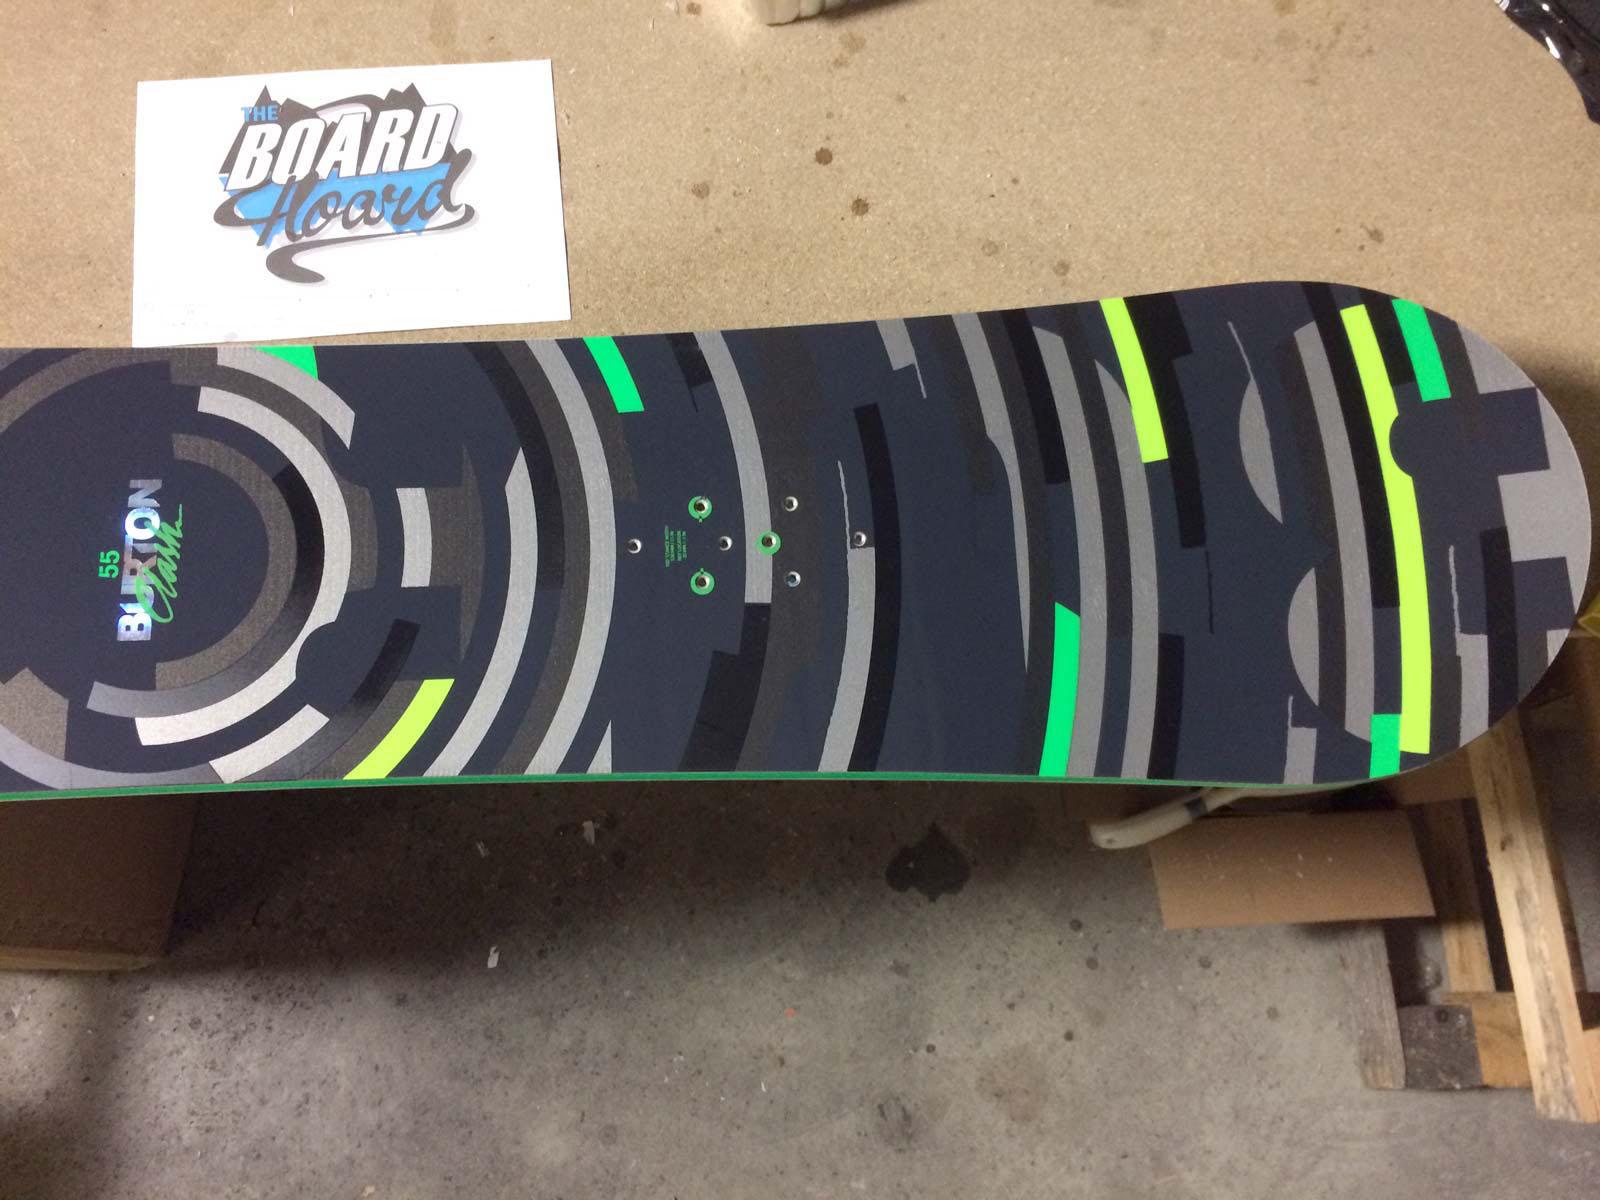 Used Burton Clash Rocker Snowboard 155cm - Excellent Condition - 9 ... b655c63ff